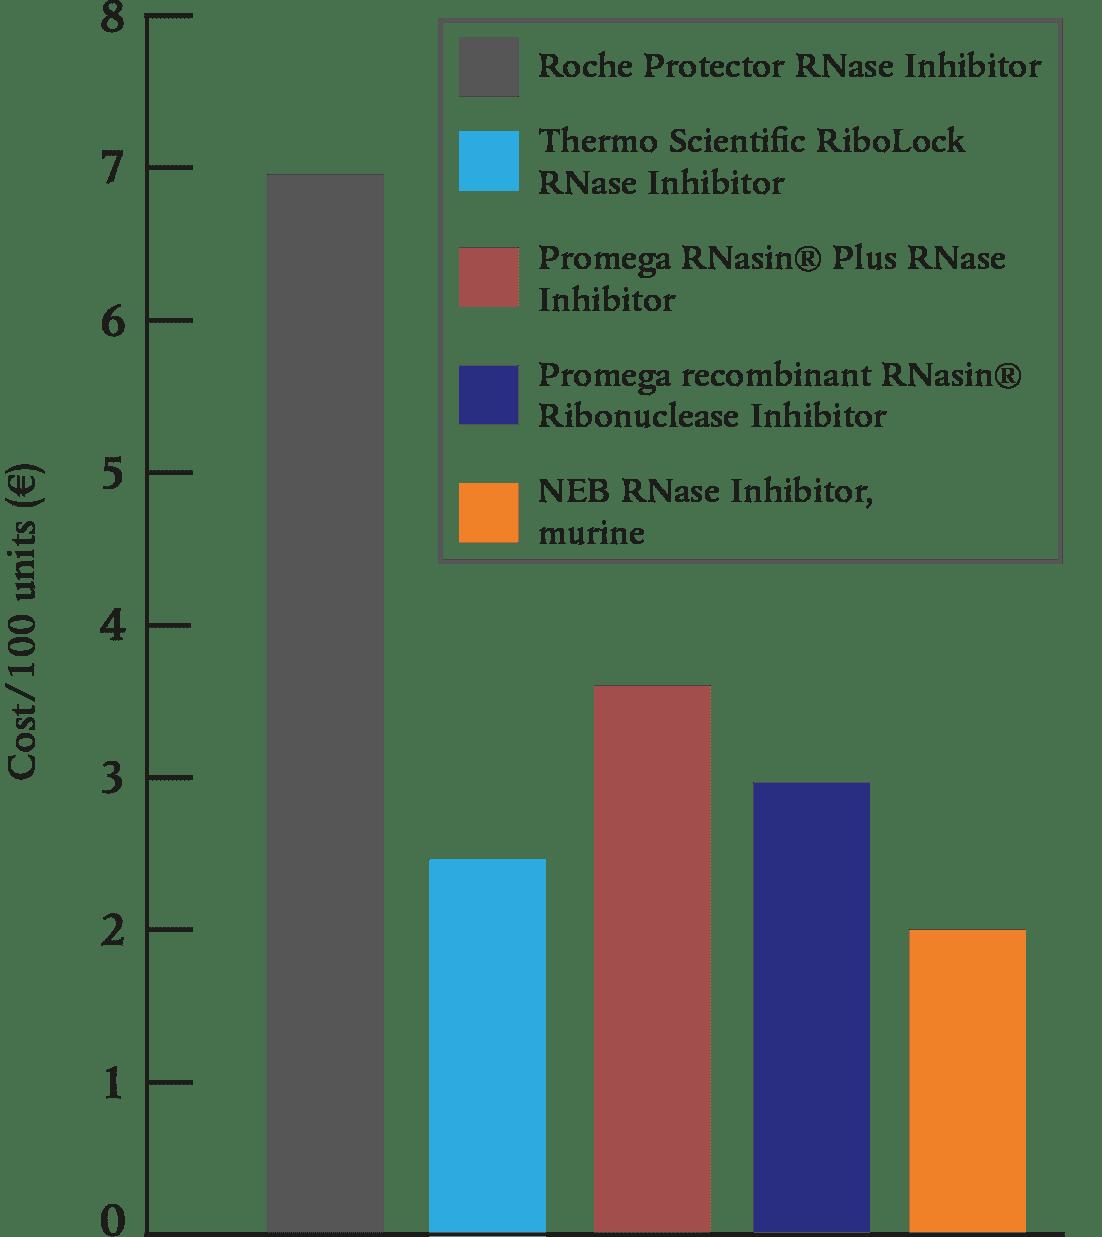 RNase_Inhibitor_costs-comparison_2021